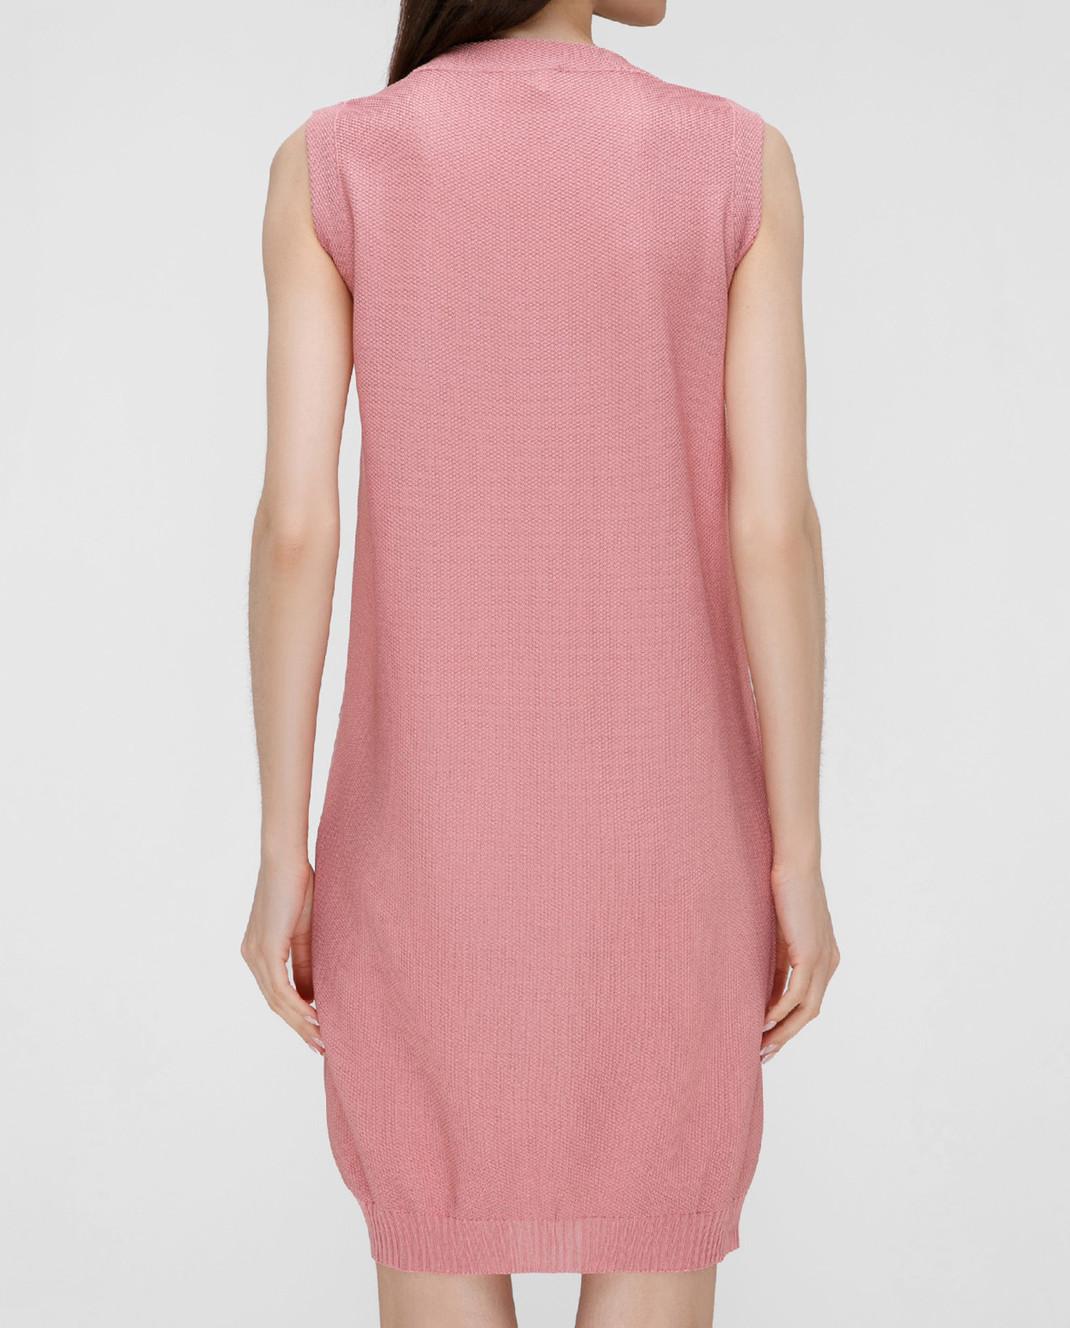 Antonella Creazioni Розовое платье 12260 изображение 4